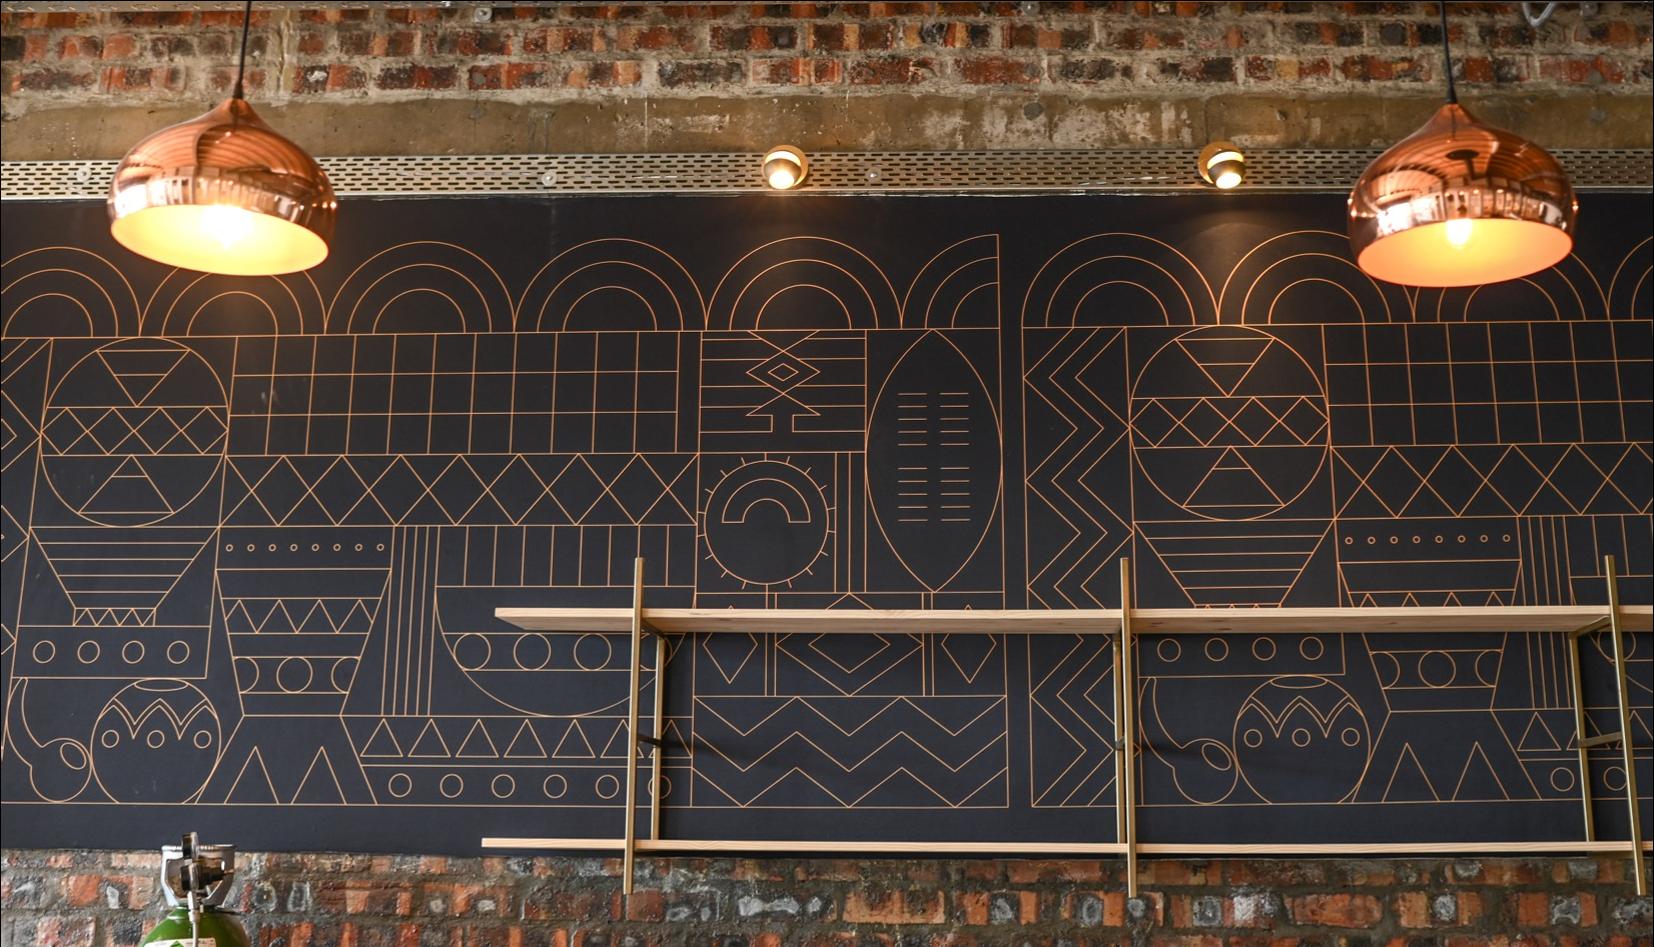 Ukhamba Beerworx Mural Design